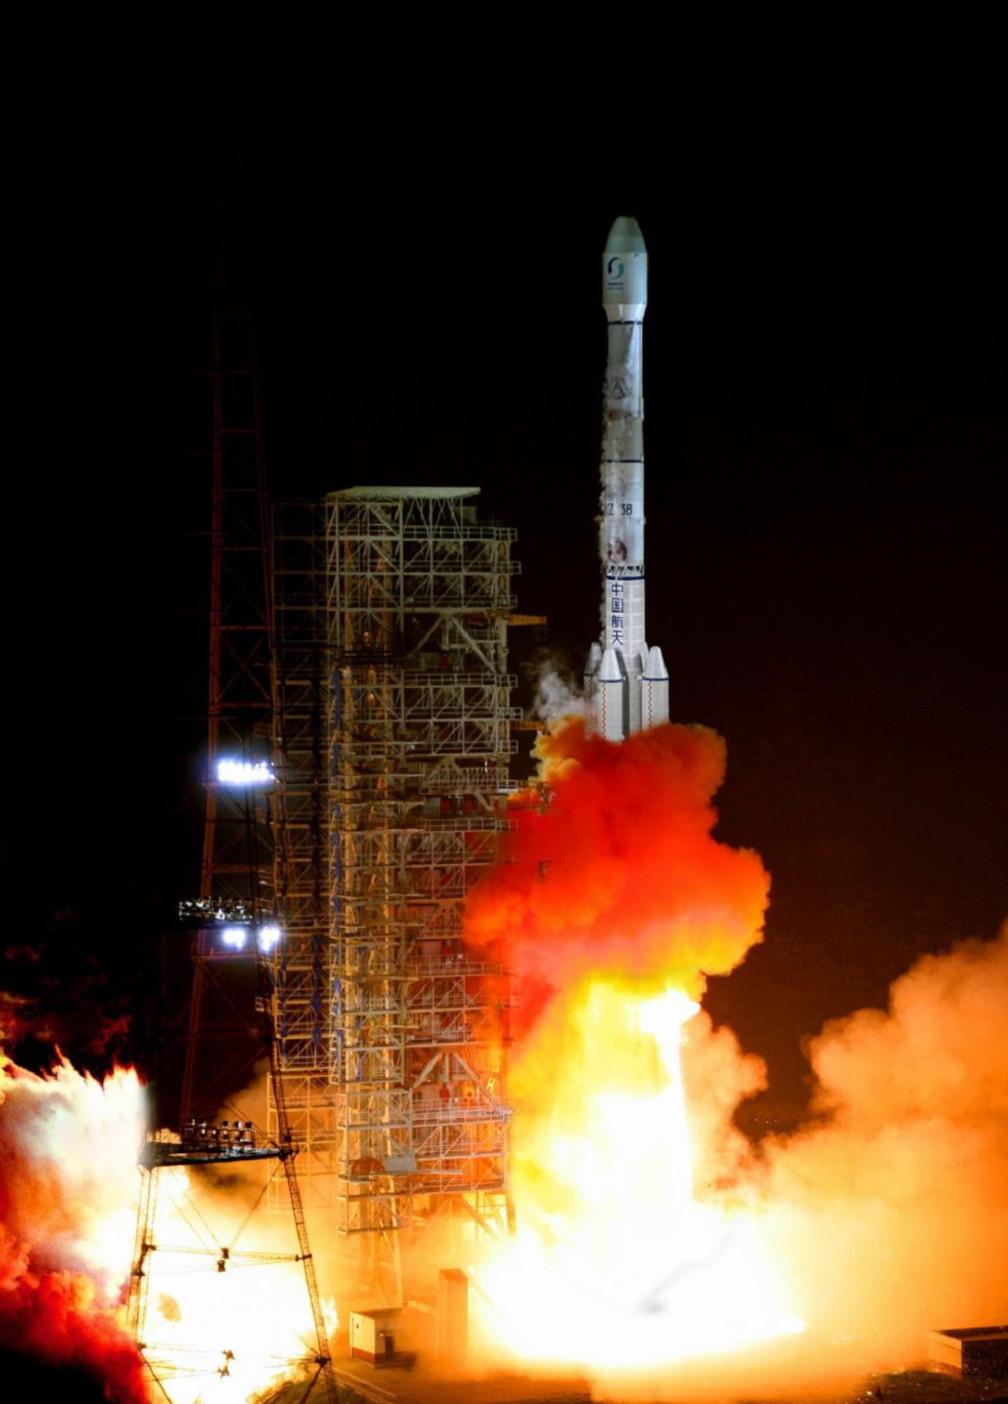 1000+ images about Rocket Launch on Pinterest